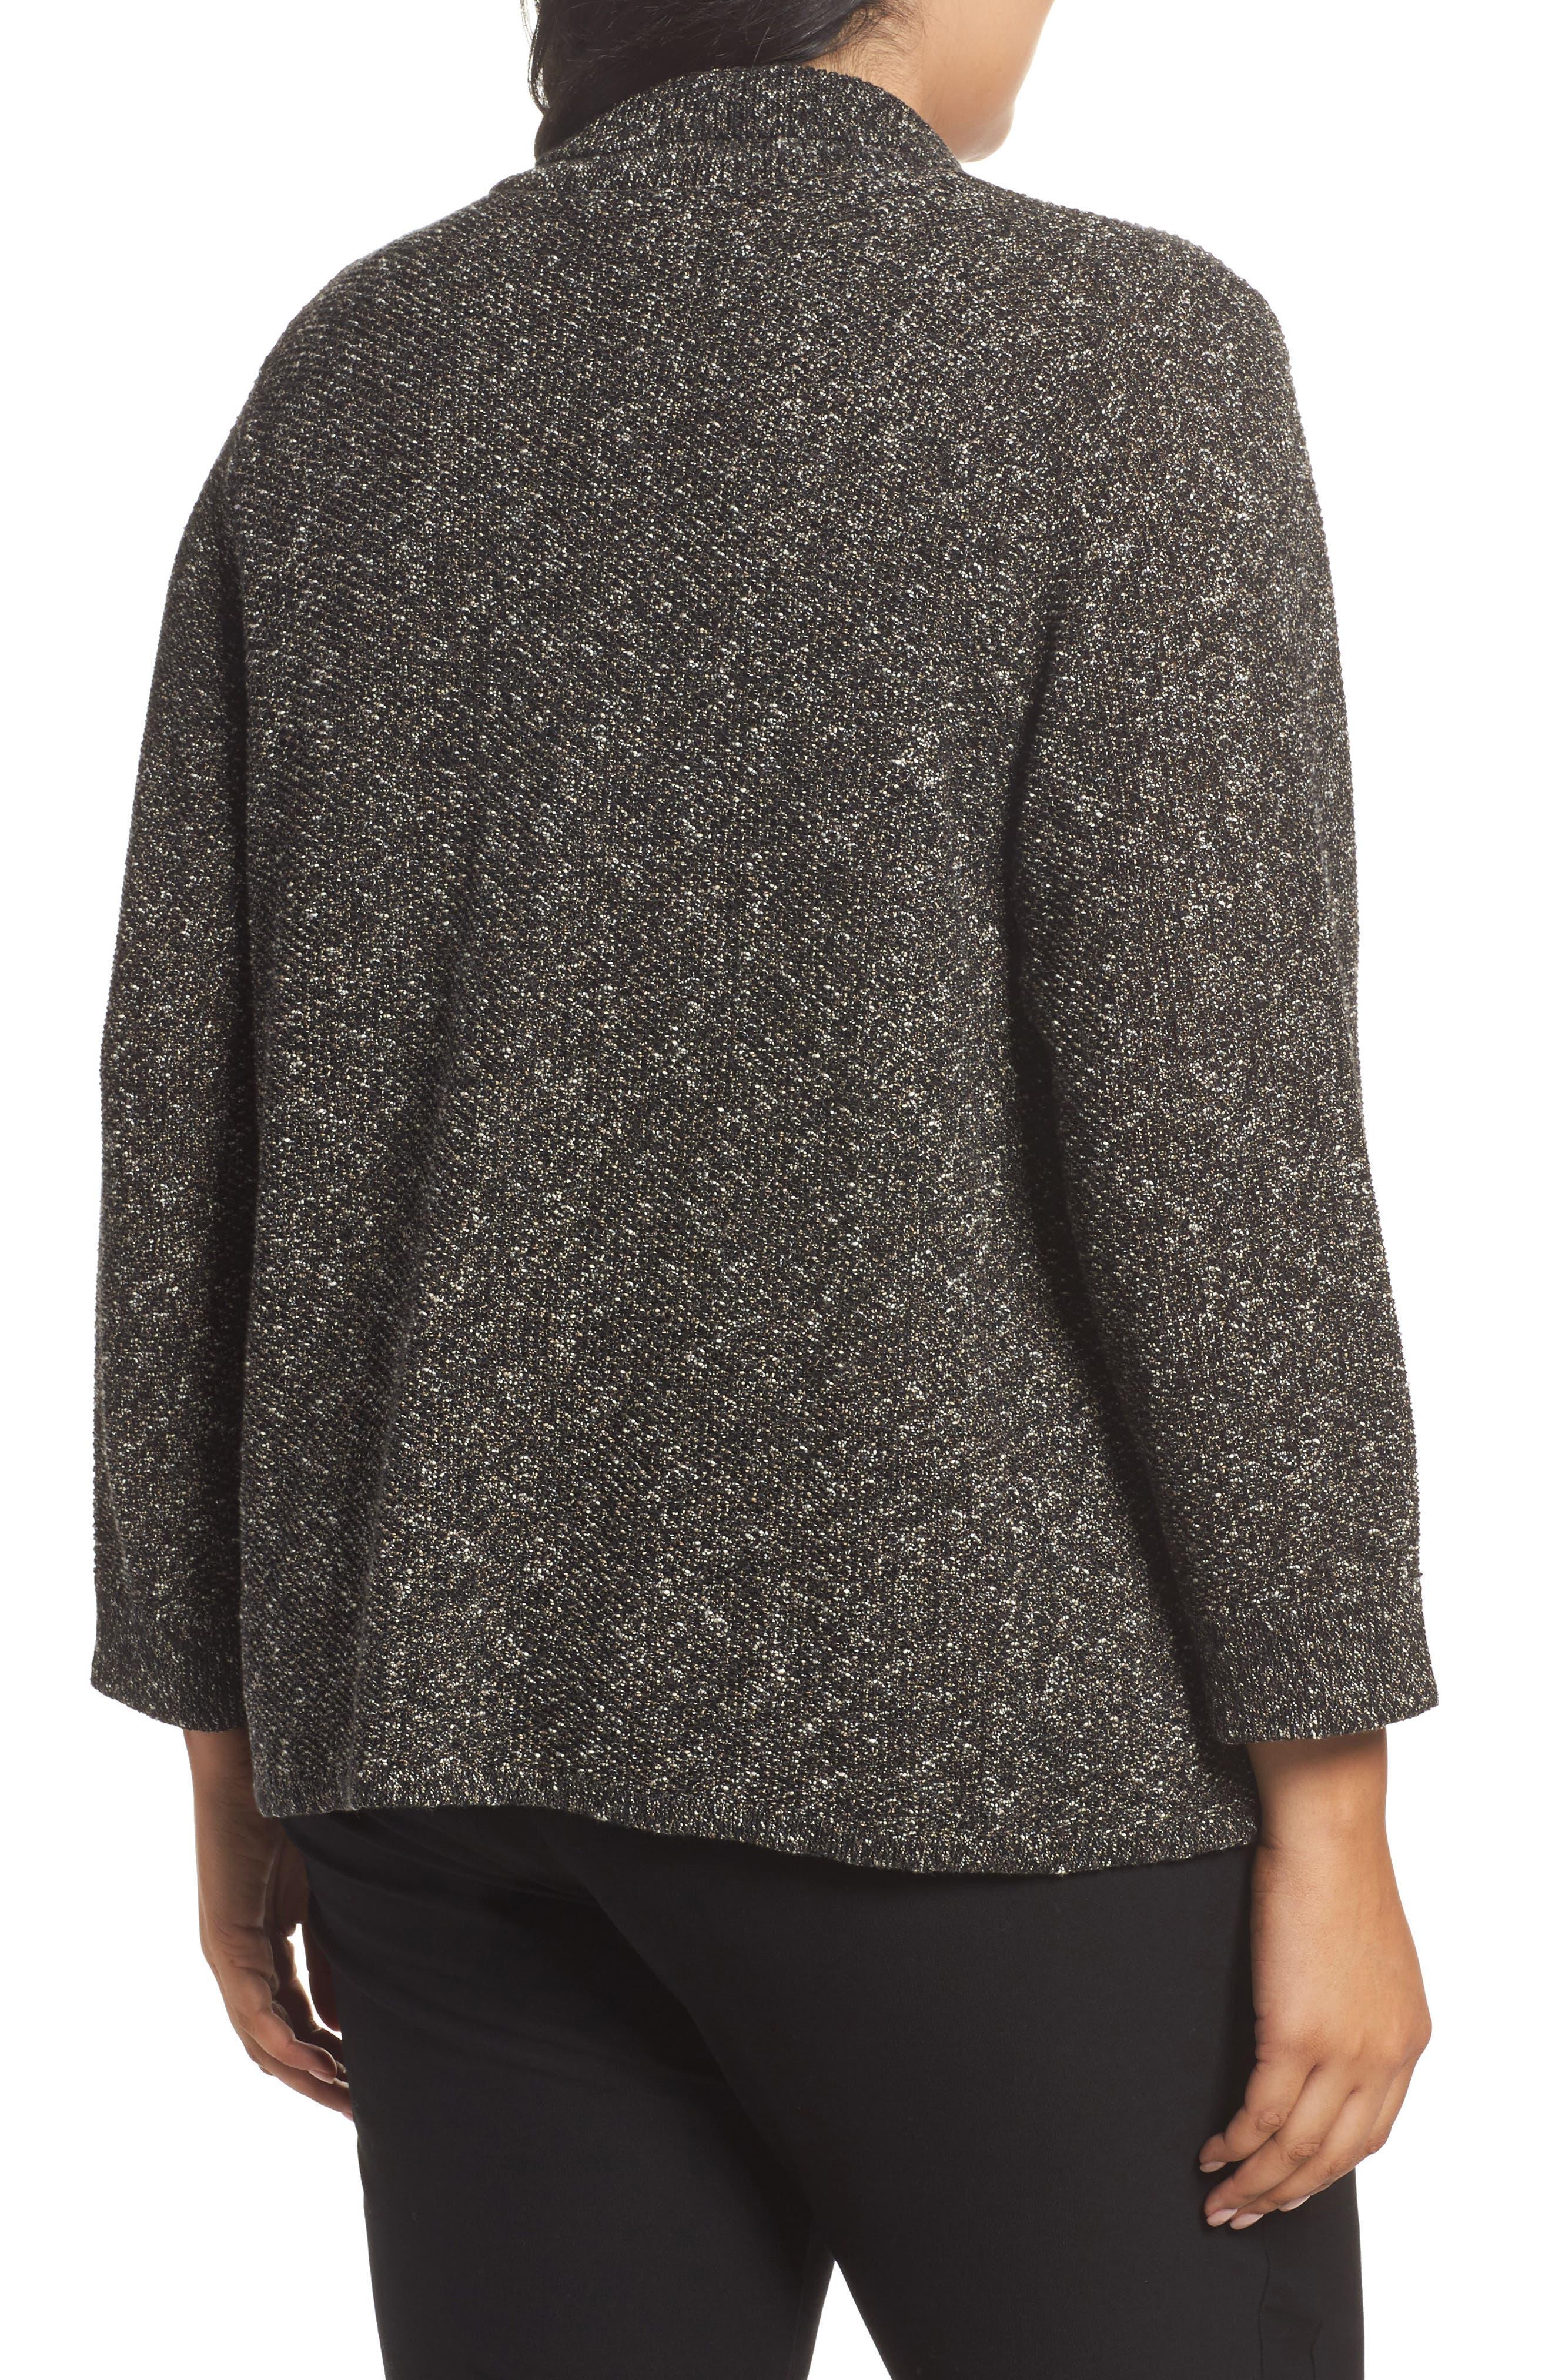 Alternate Image 2  - Eileen Fisher Organic Cotton Blend Sweater Jacket (Plus Size)